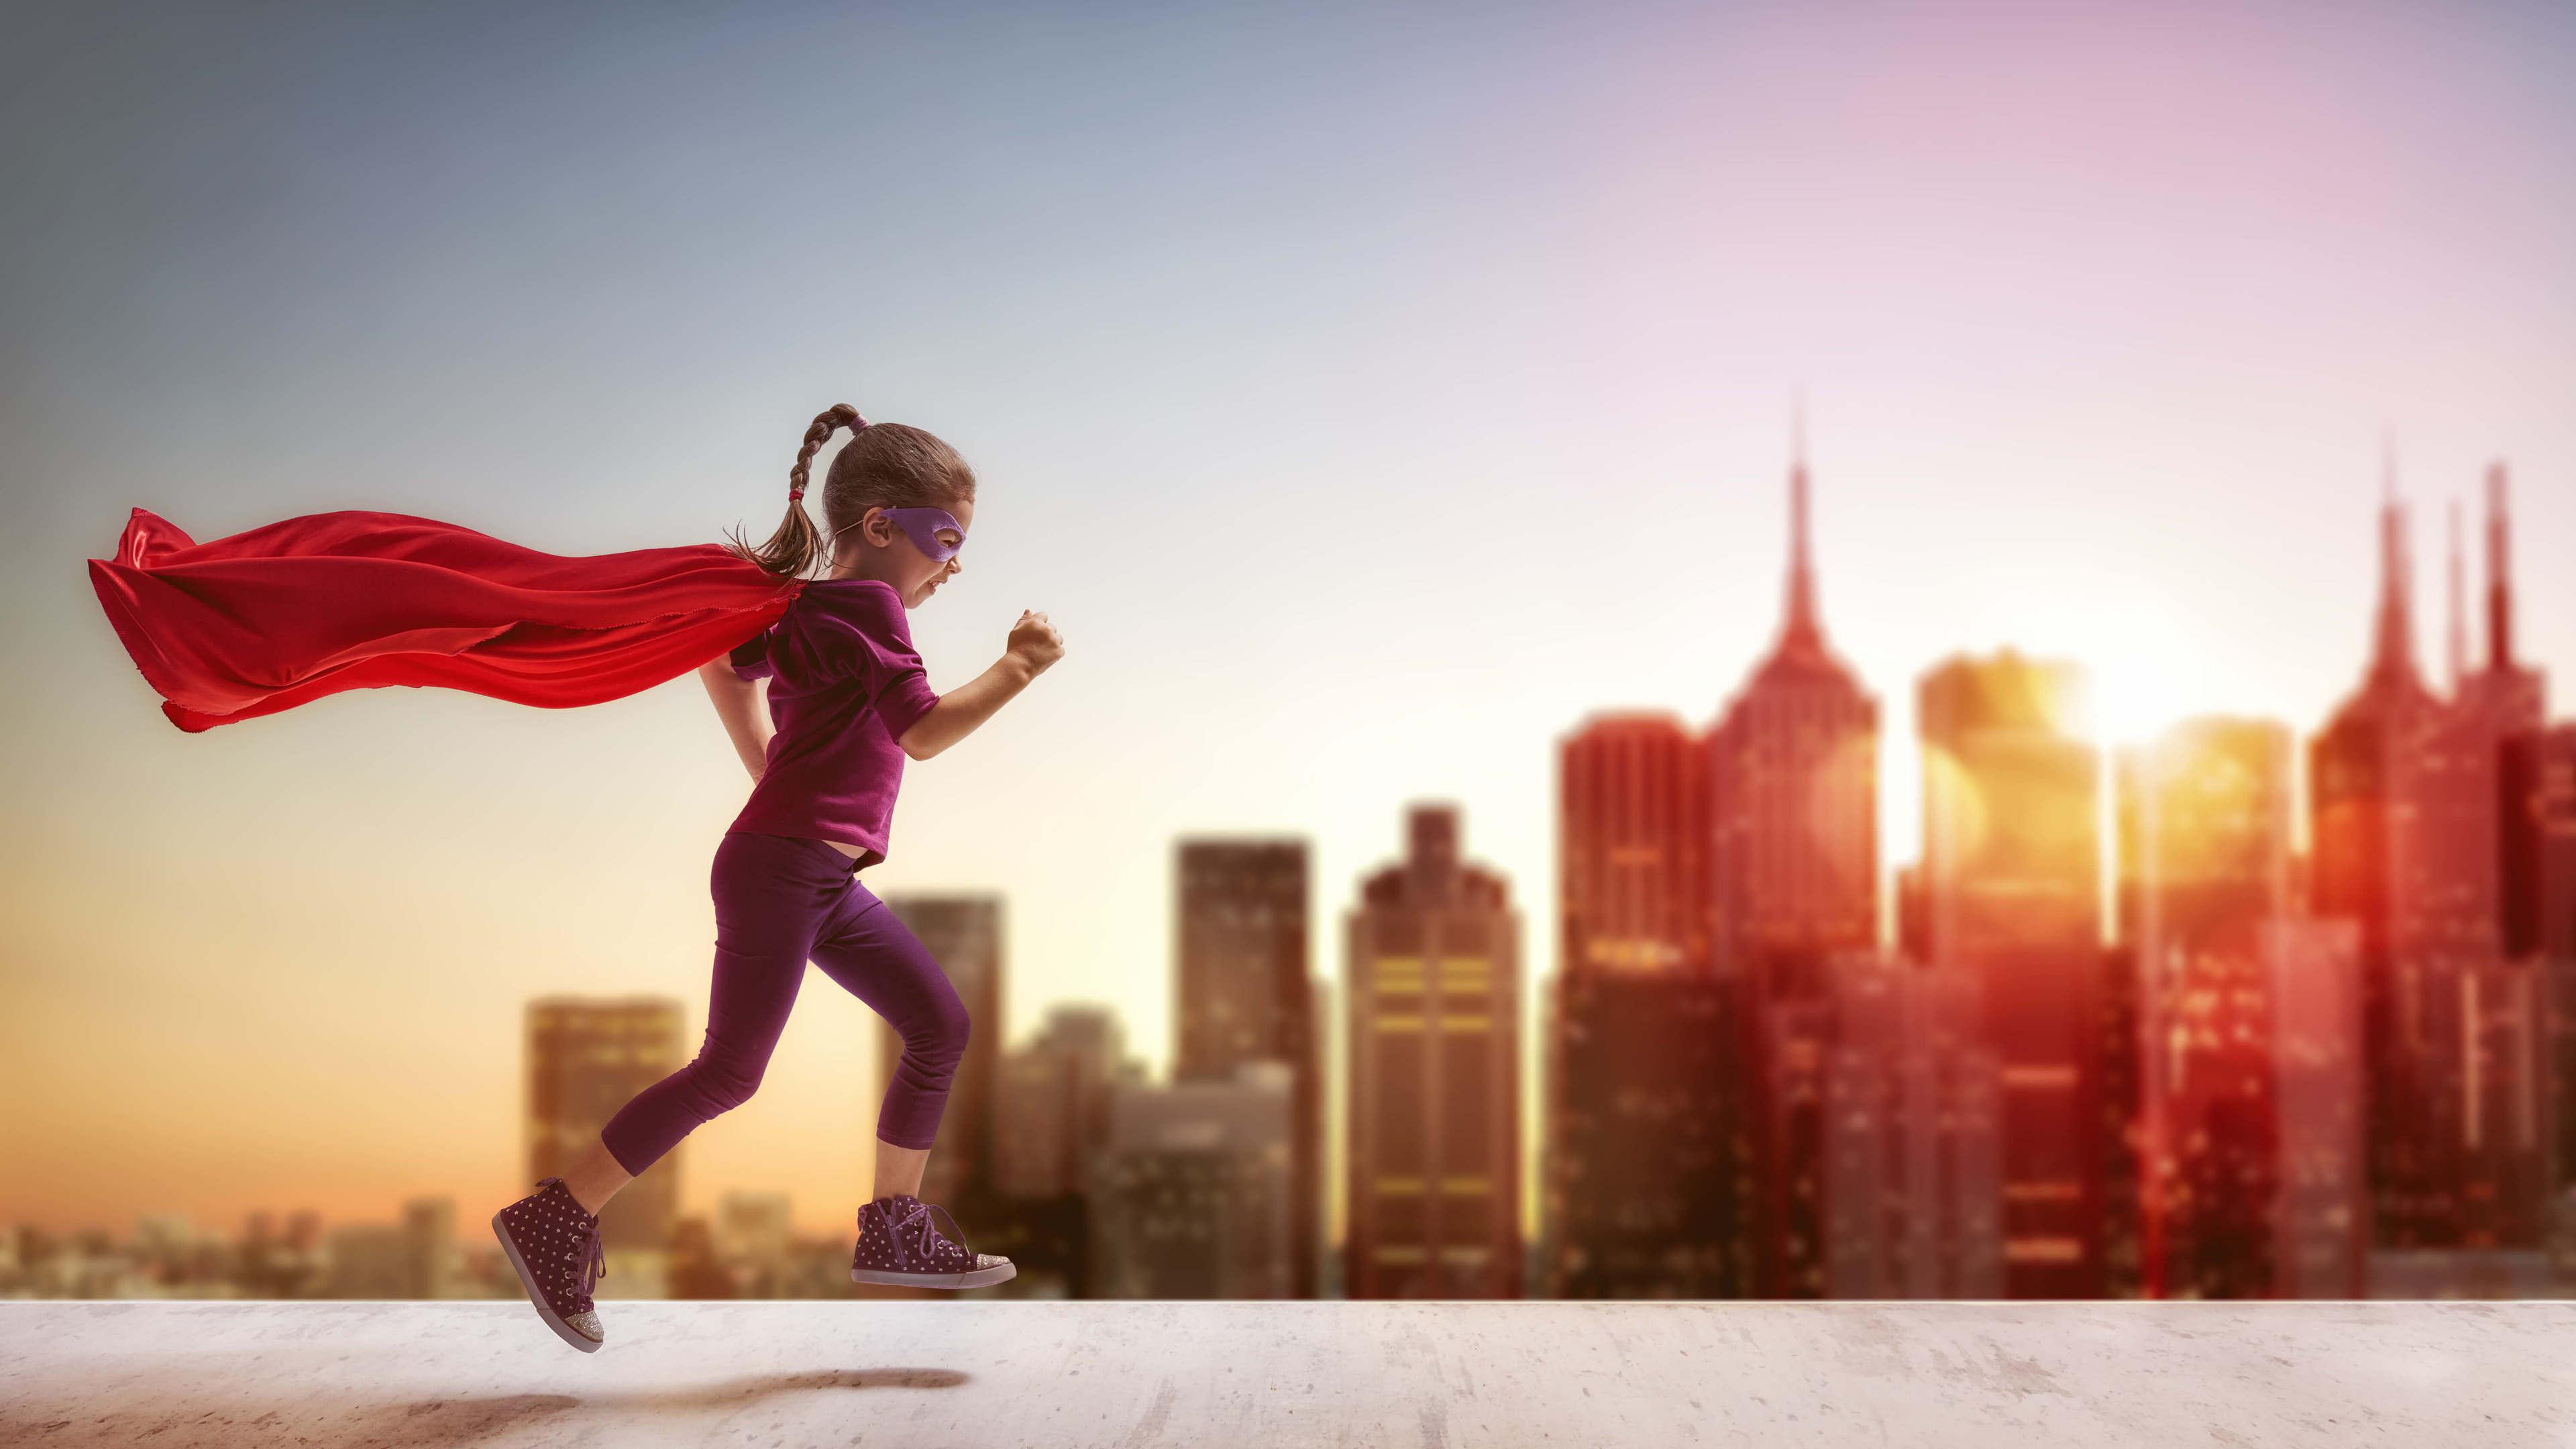 kid supergirl 4k 1547936496 - Kid Supergirl 4k - superheroes wallpapers, supergirl wallpapers, hd-wallpapers, 5k wallpapers, 4k-wallpapers